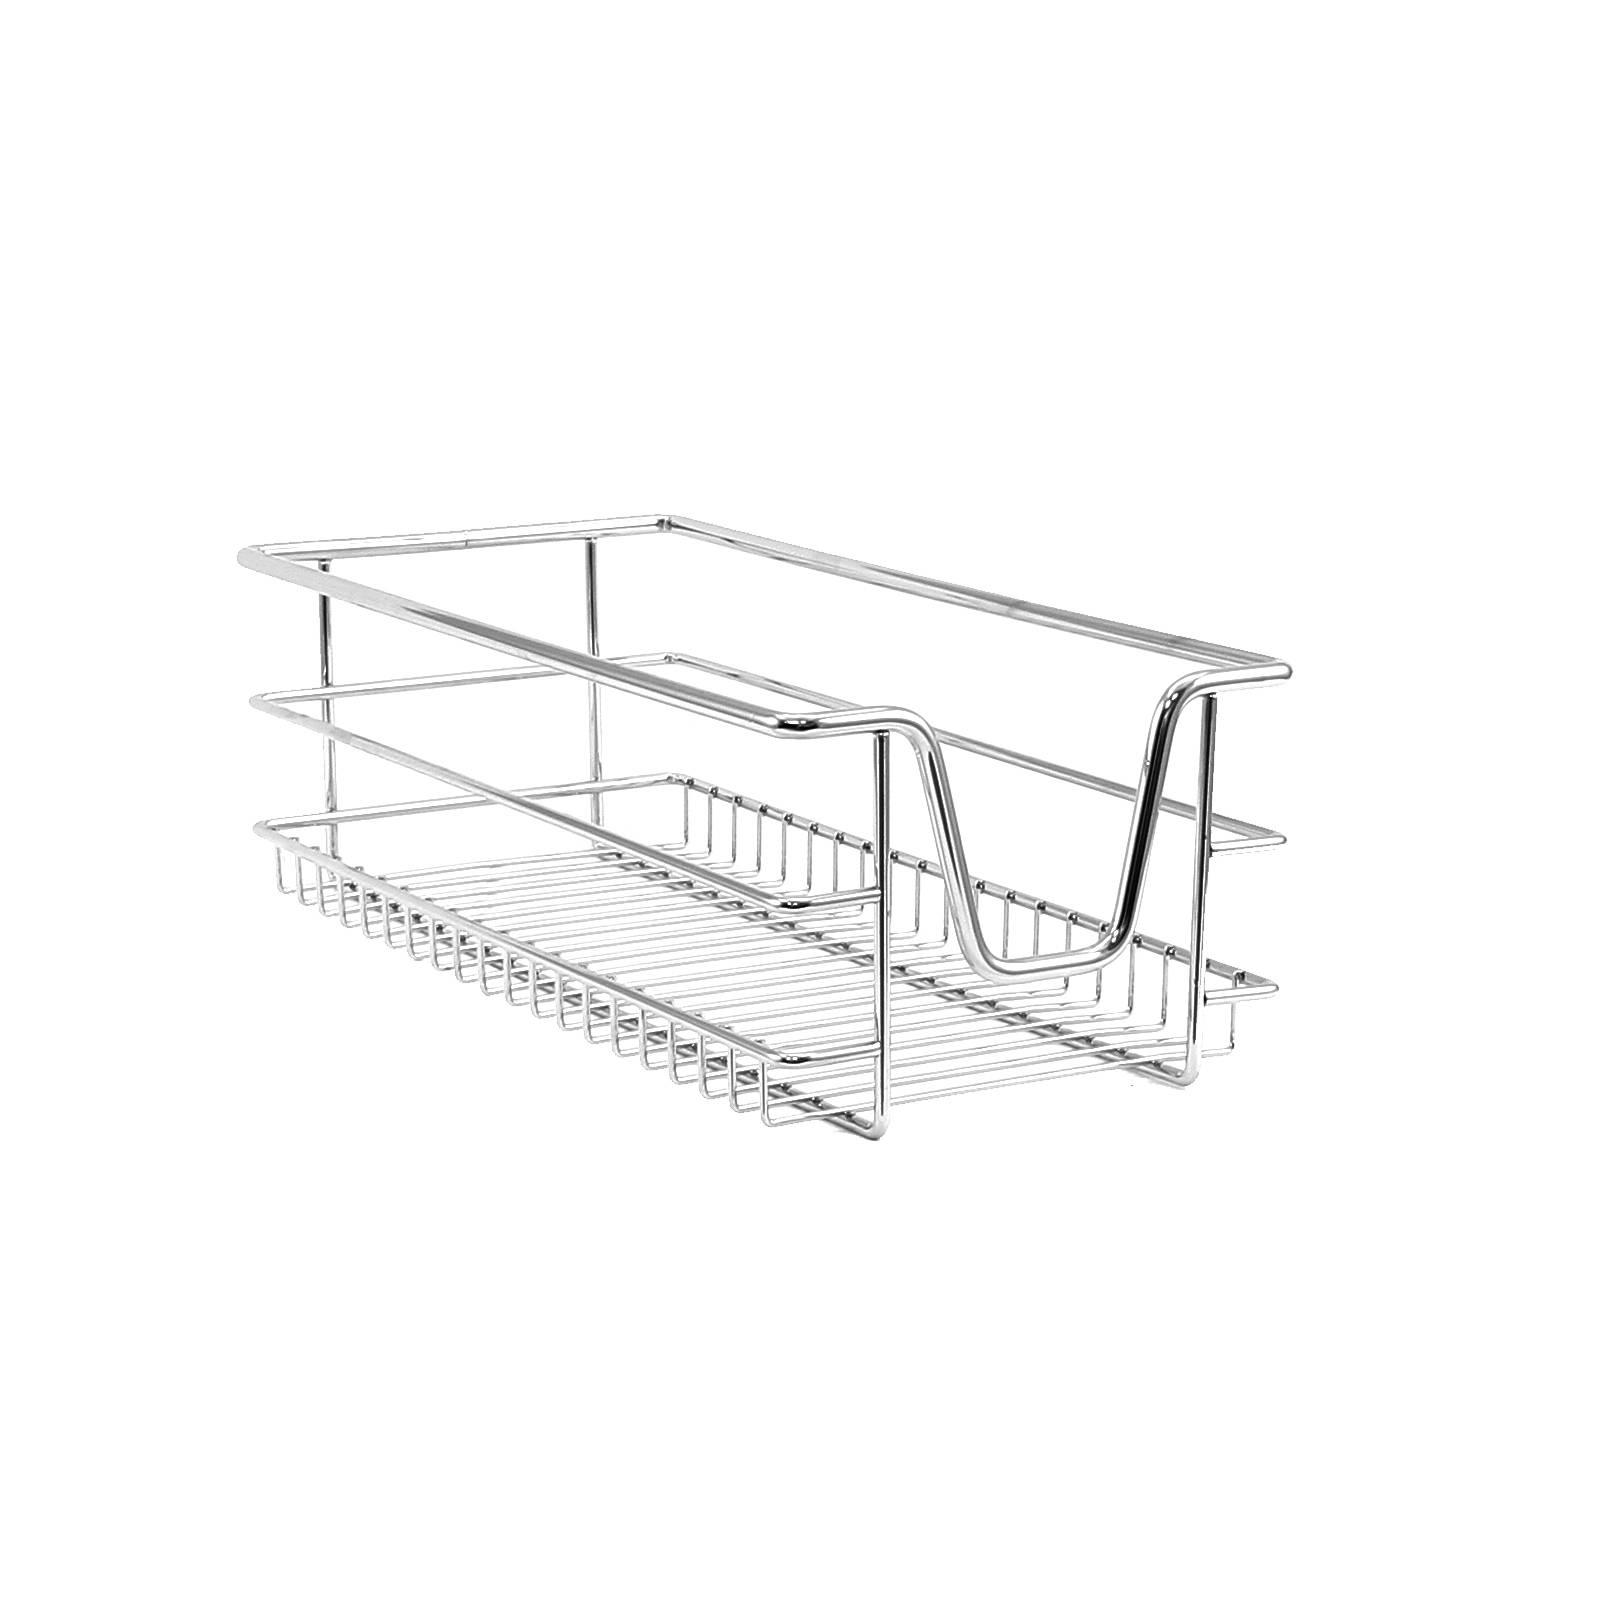 2 Kitchen Wire Baskets Pull Out Storage Drawer Slide Out Larder Cupboard 30cm